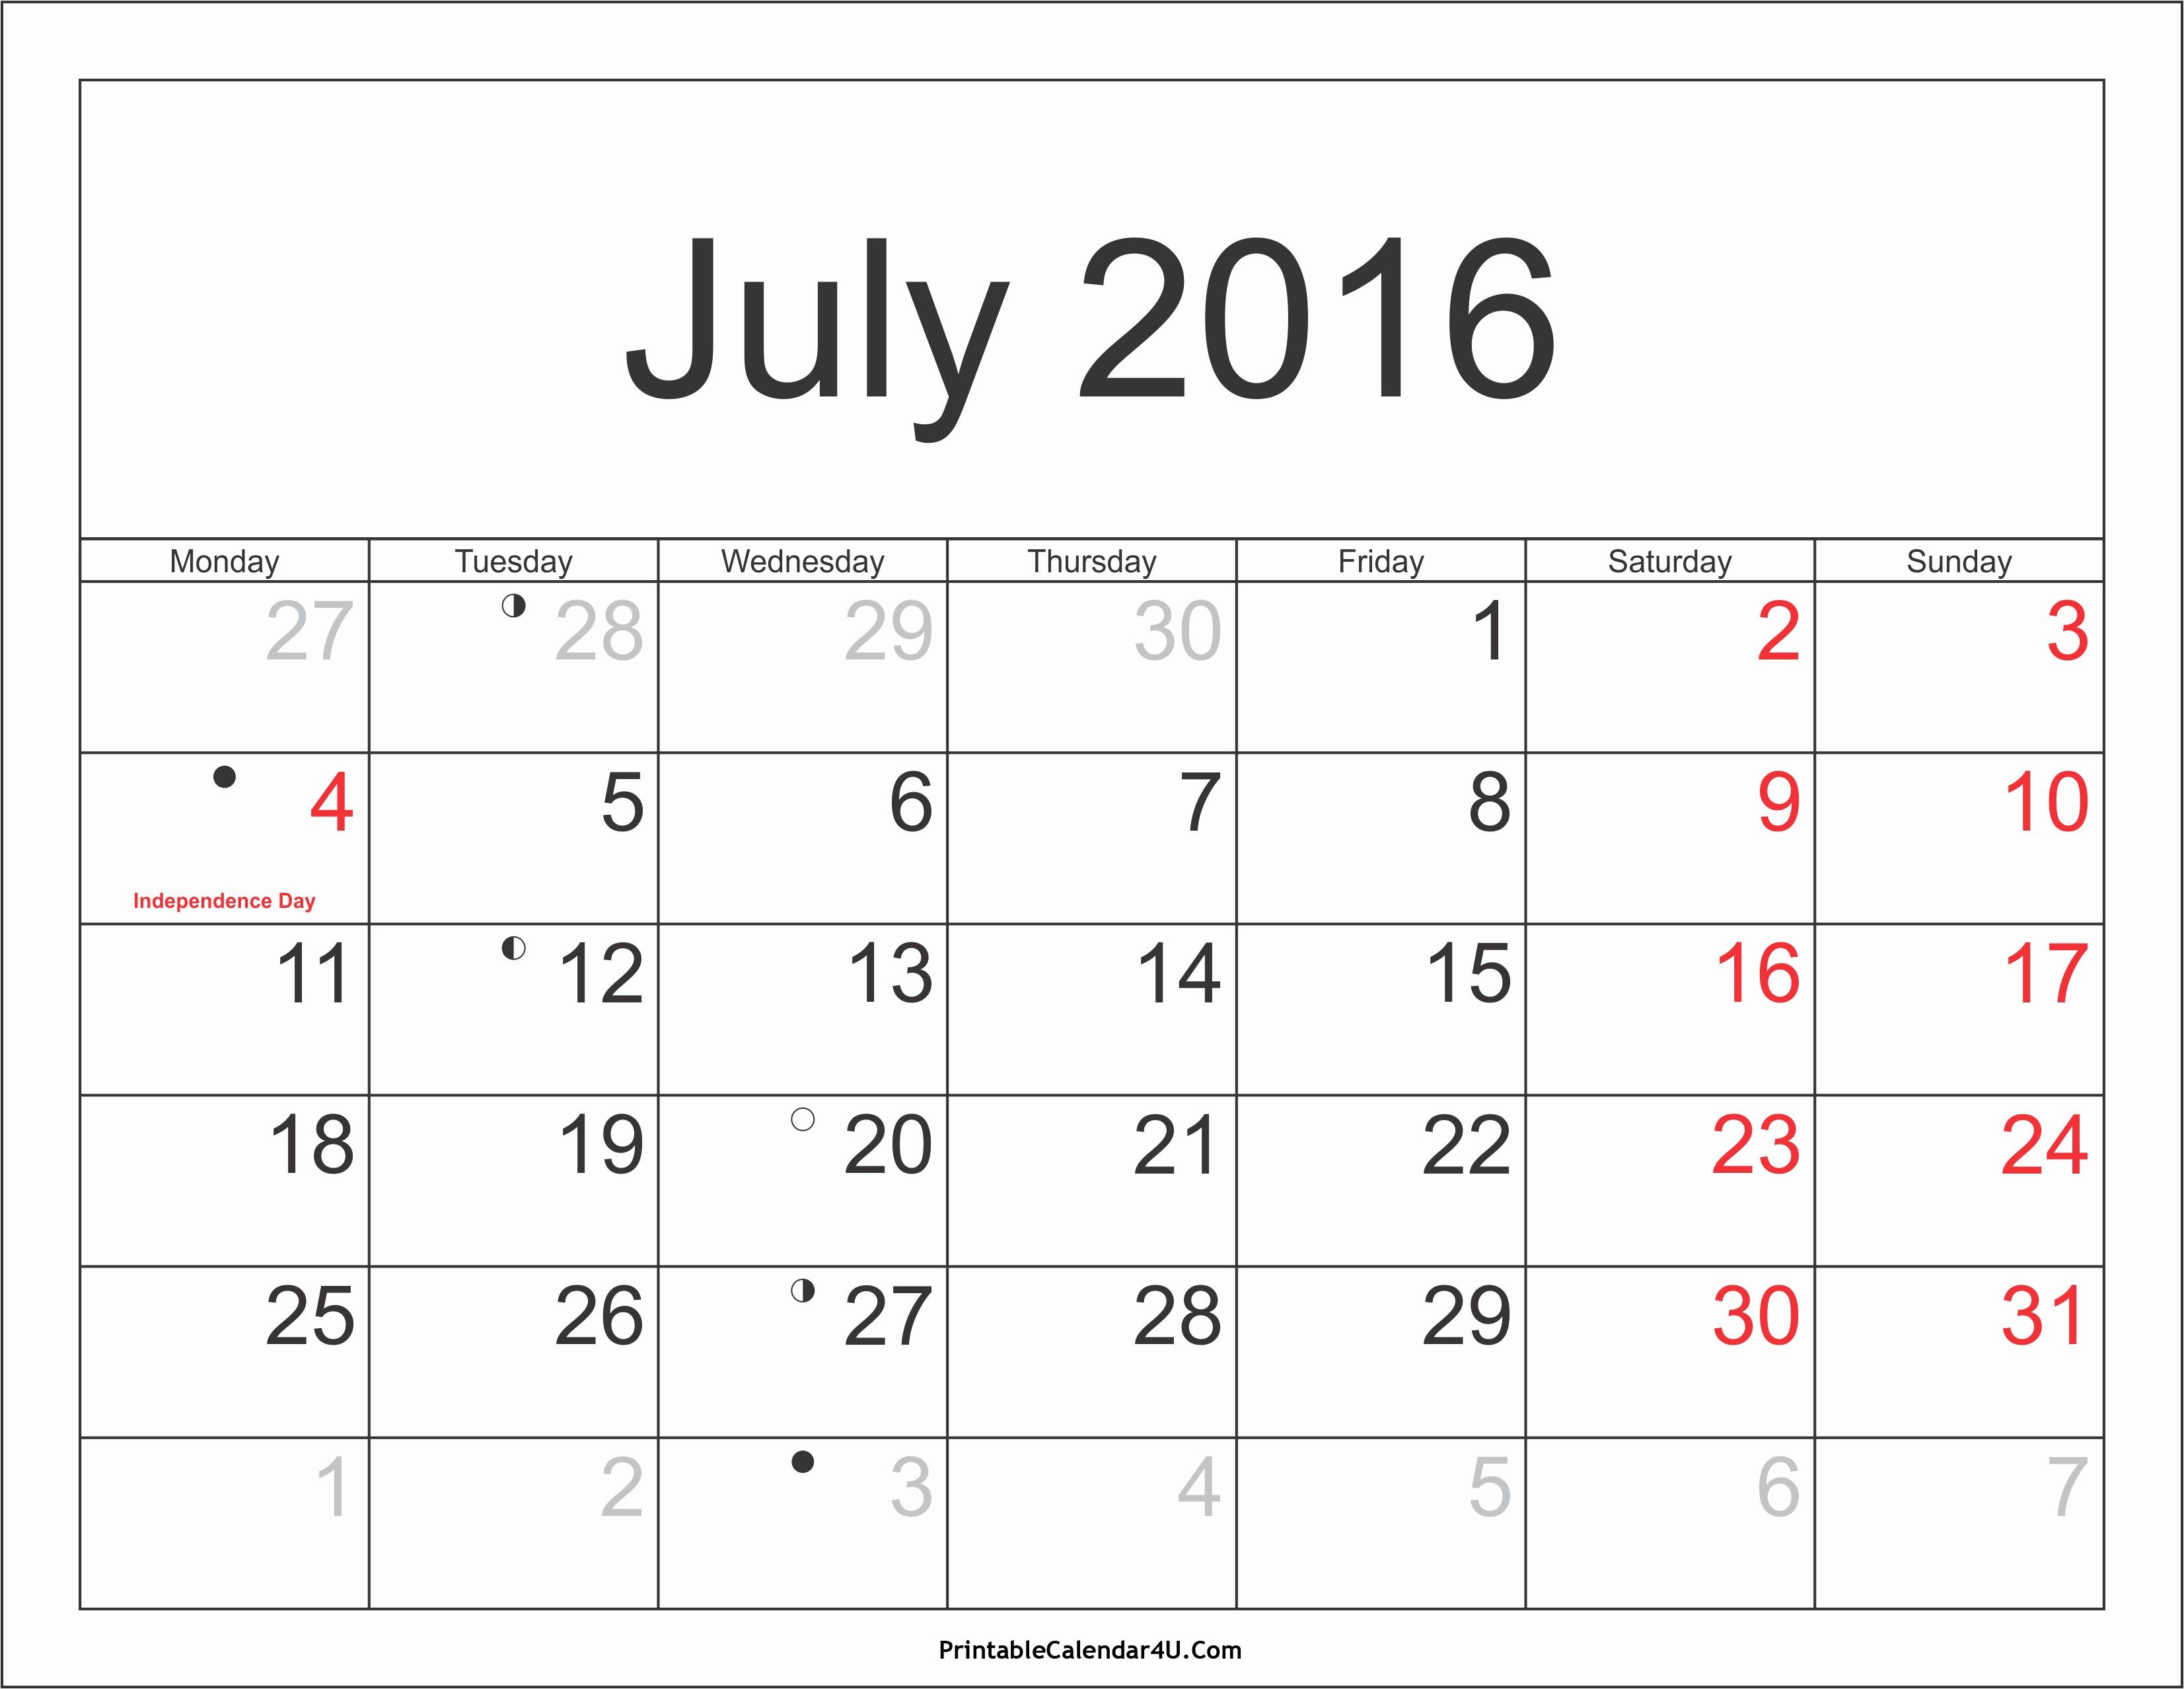 Printable 2016 Calendars with Holidays Elegant July 2016 Calendar Printable with Holidays Pdf and Jpg